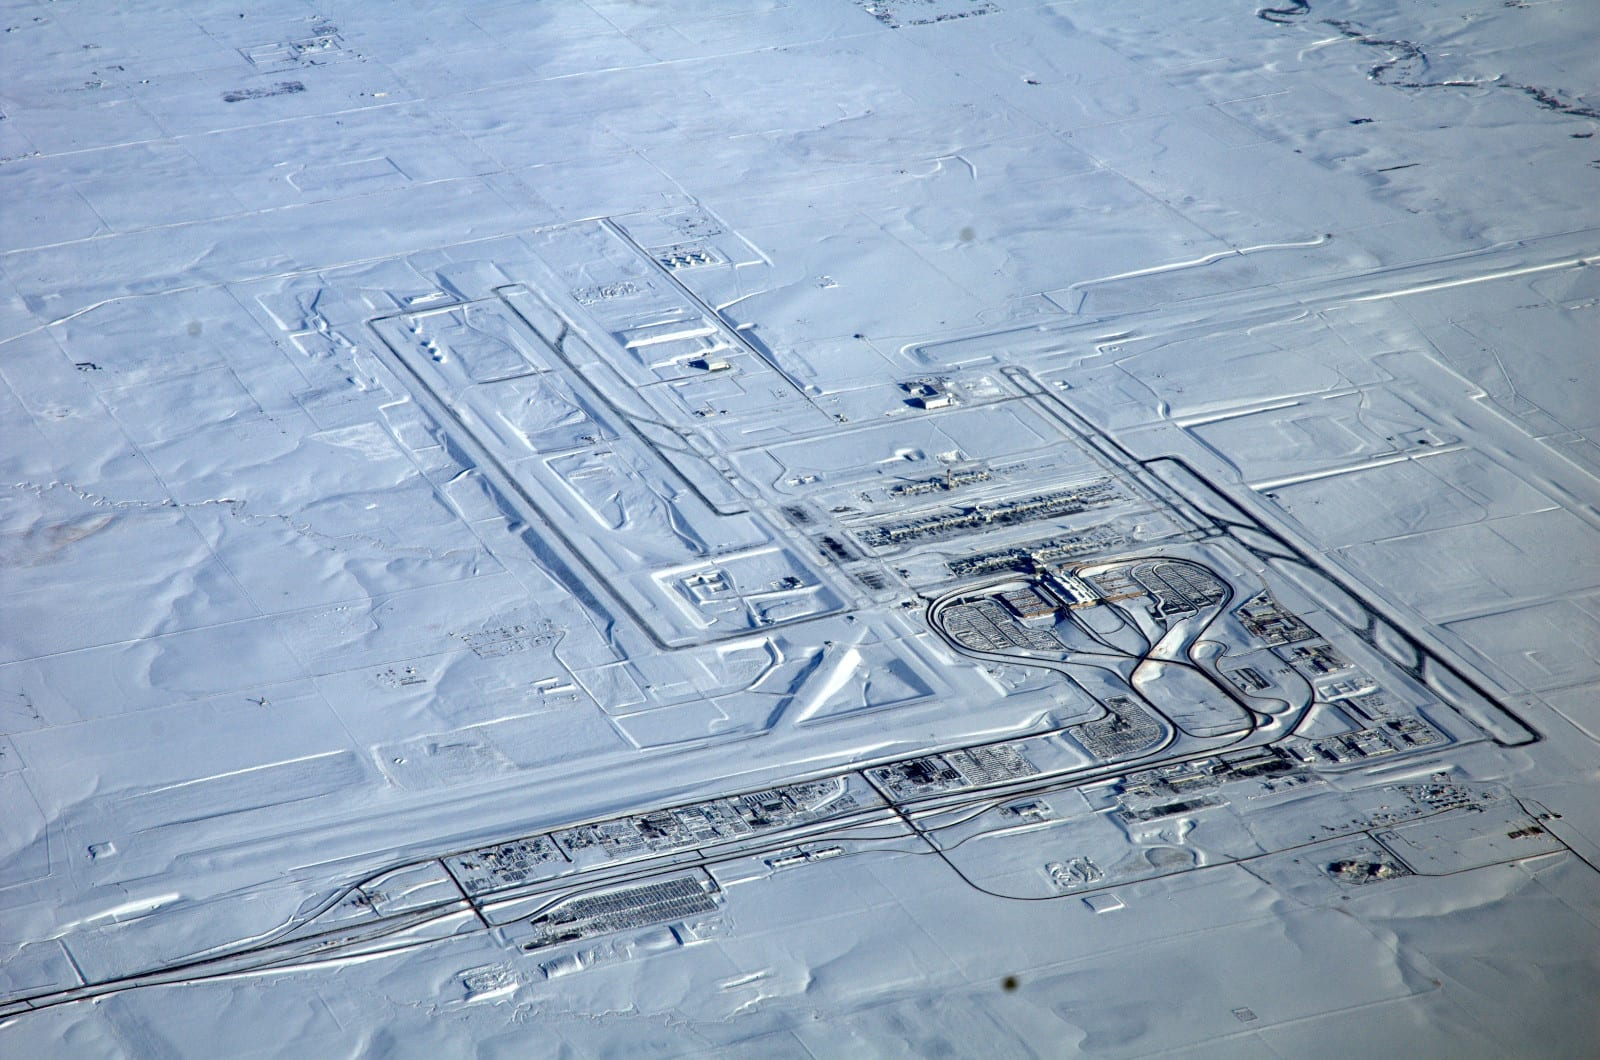 Denver International Airport Aerial View Winter Snow